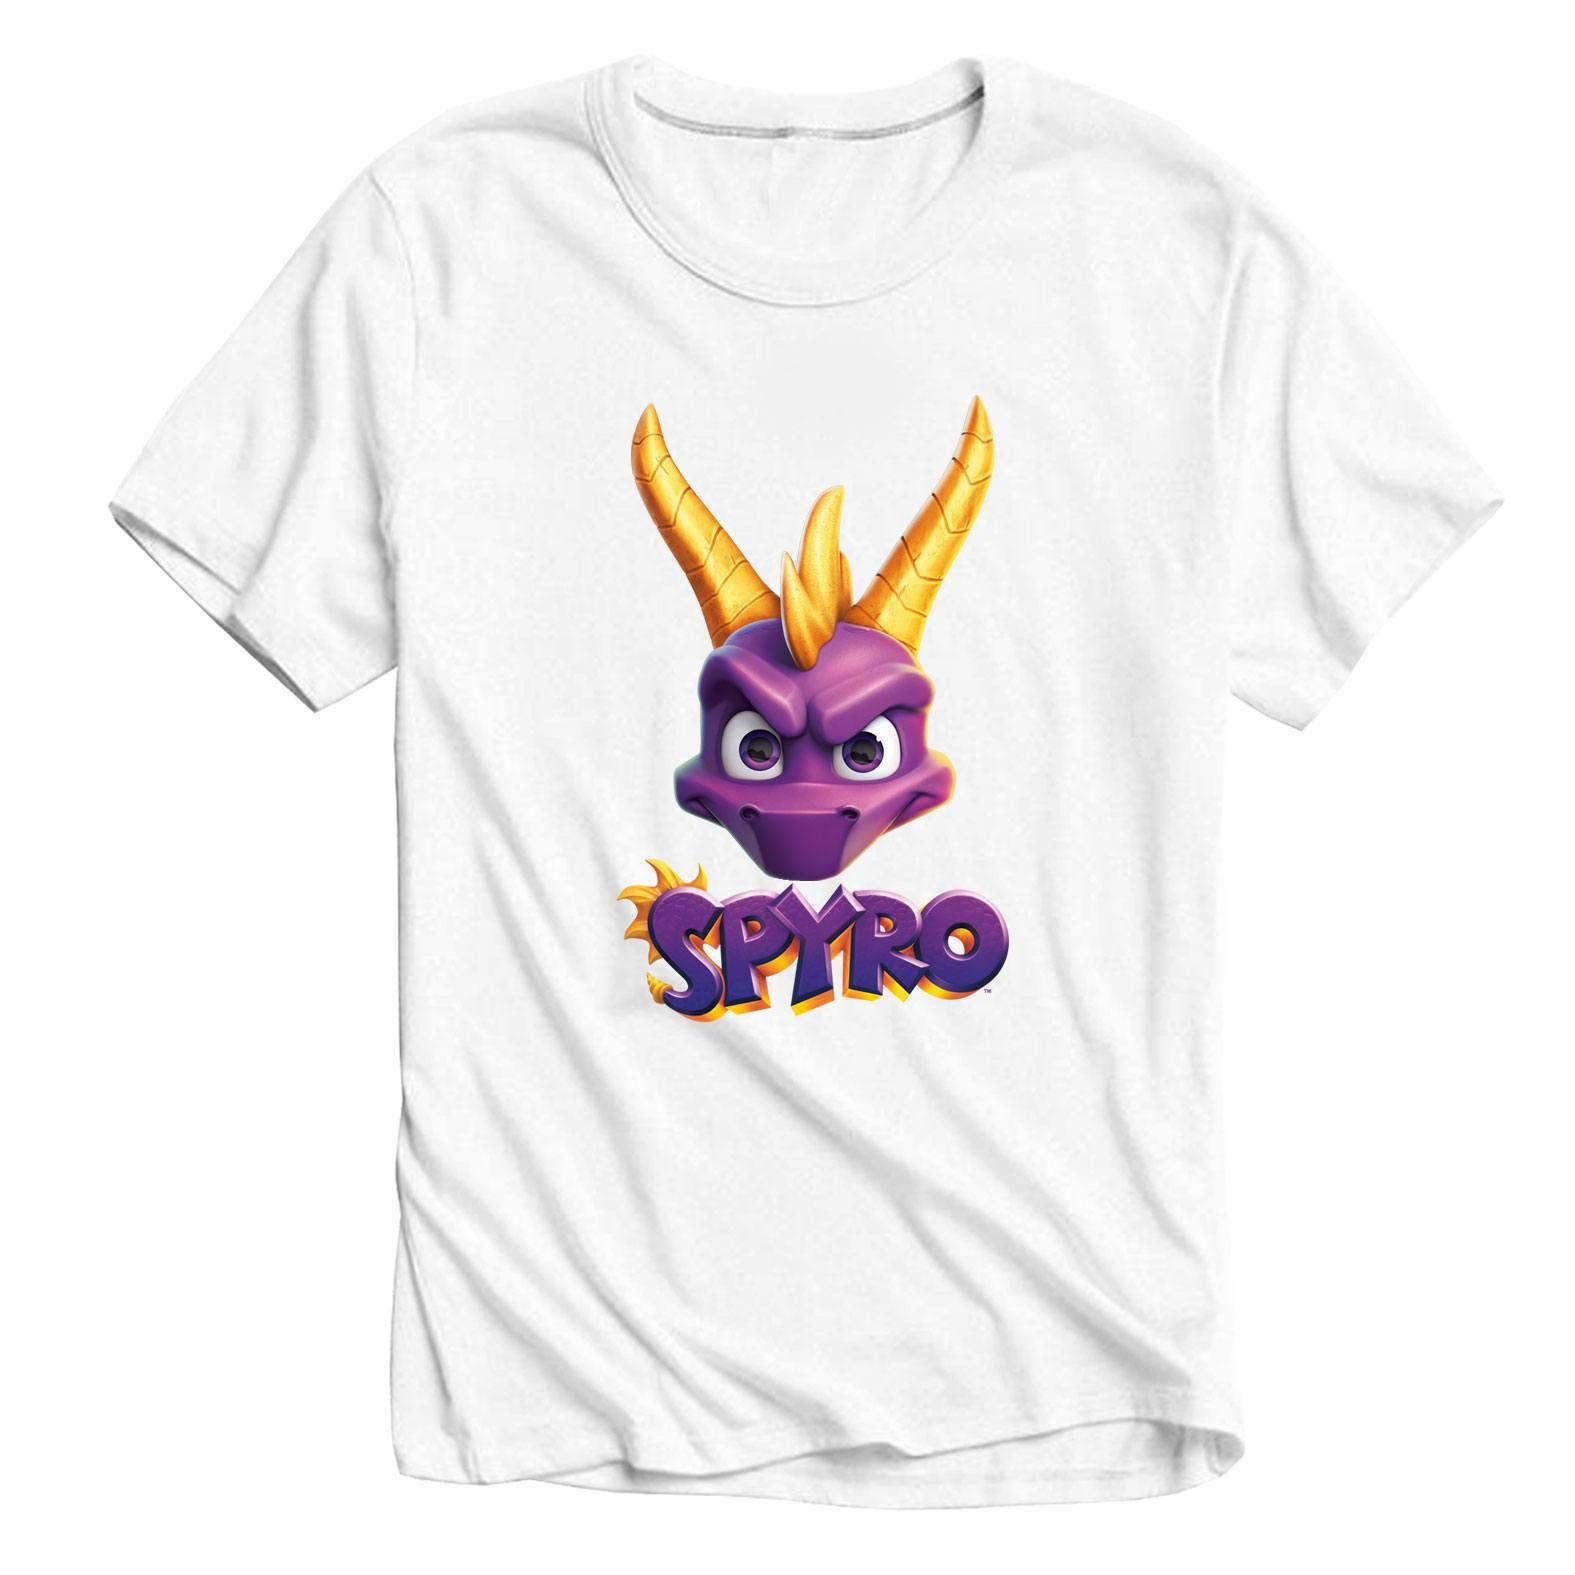 Spyro T-Shirt Face Logo Size L